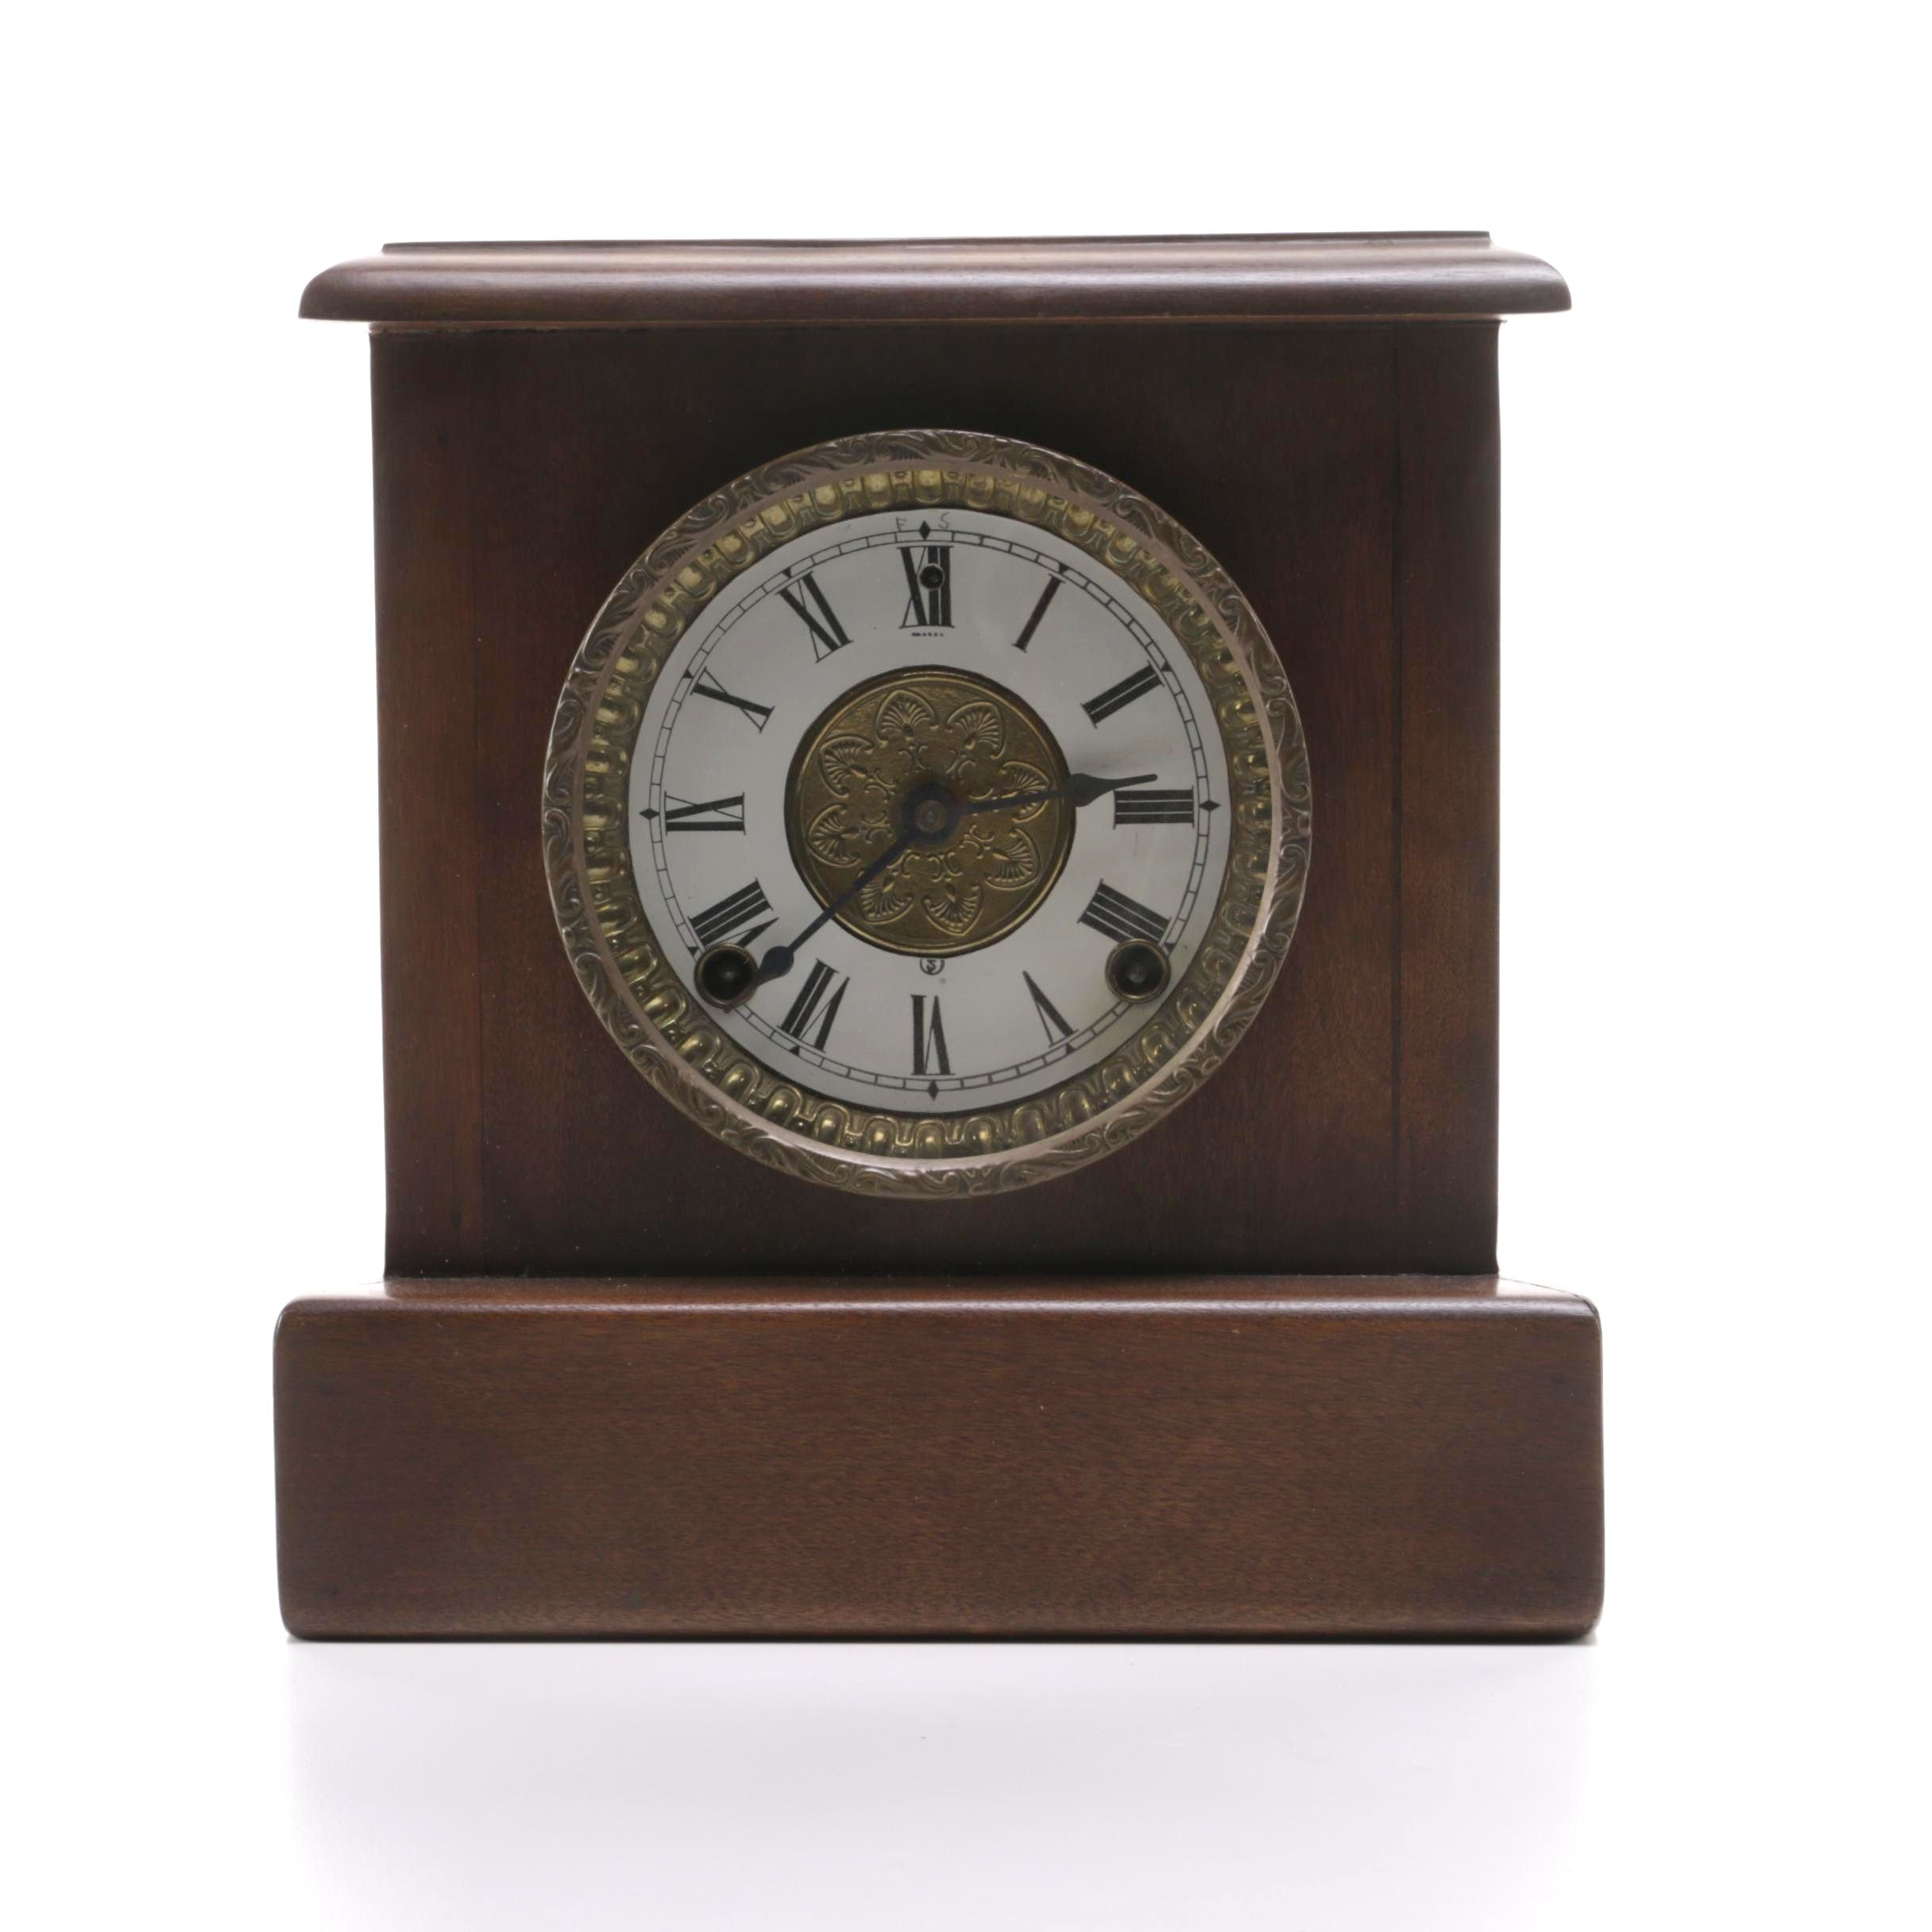 Mantel Clock in Wooden Case